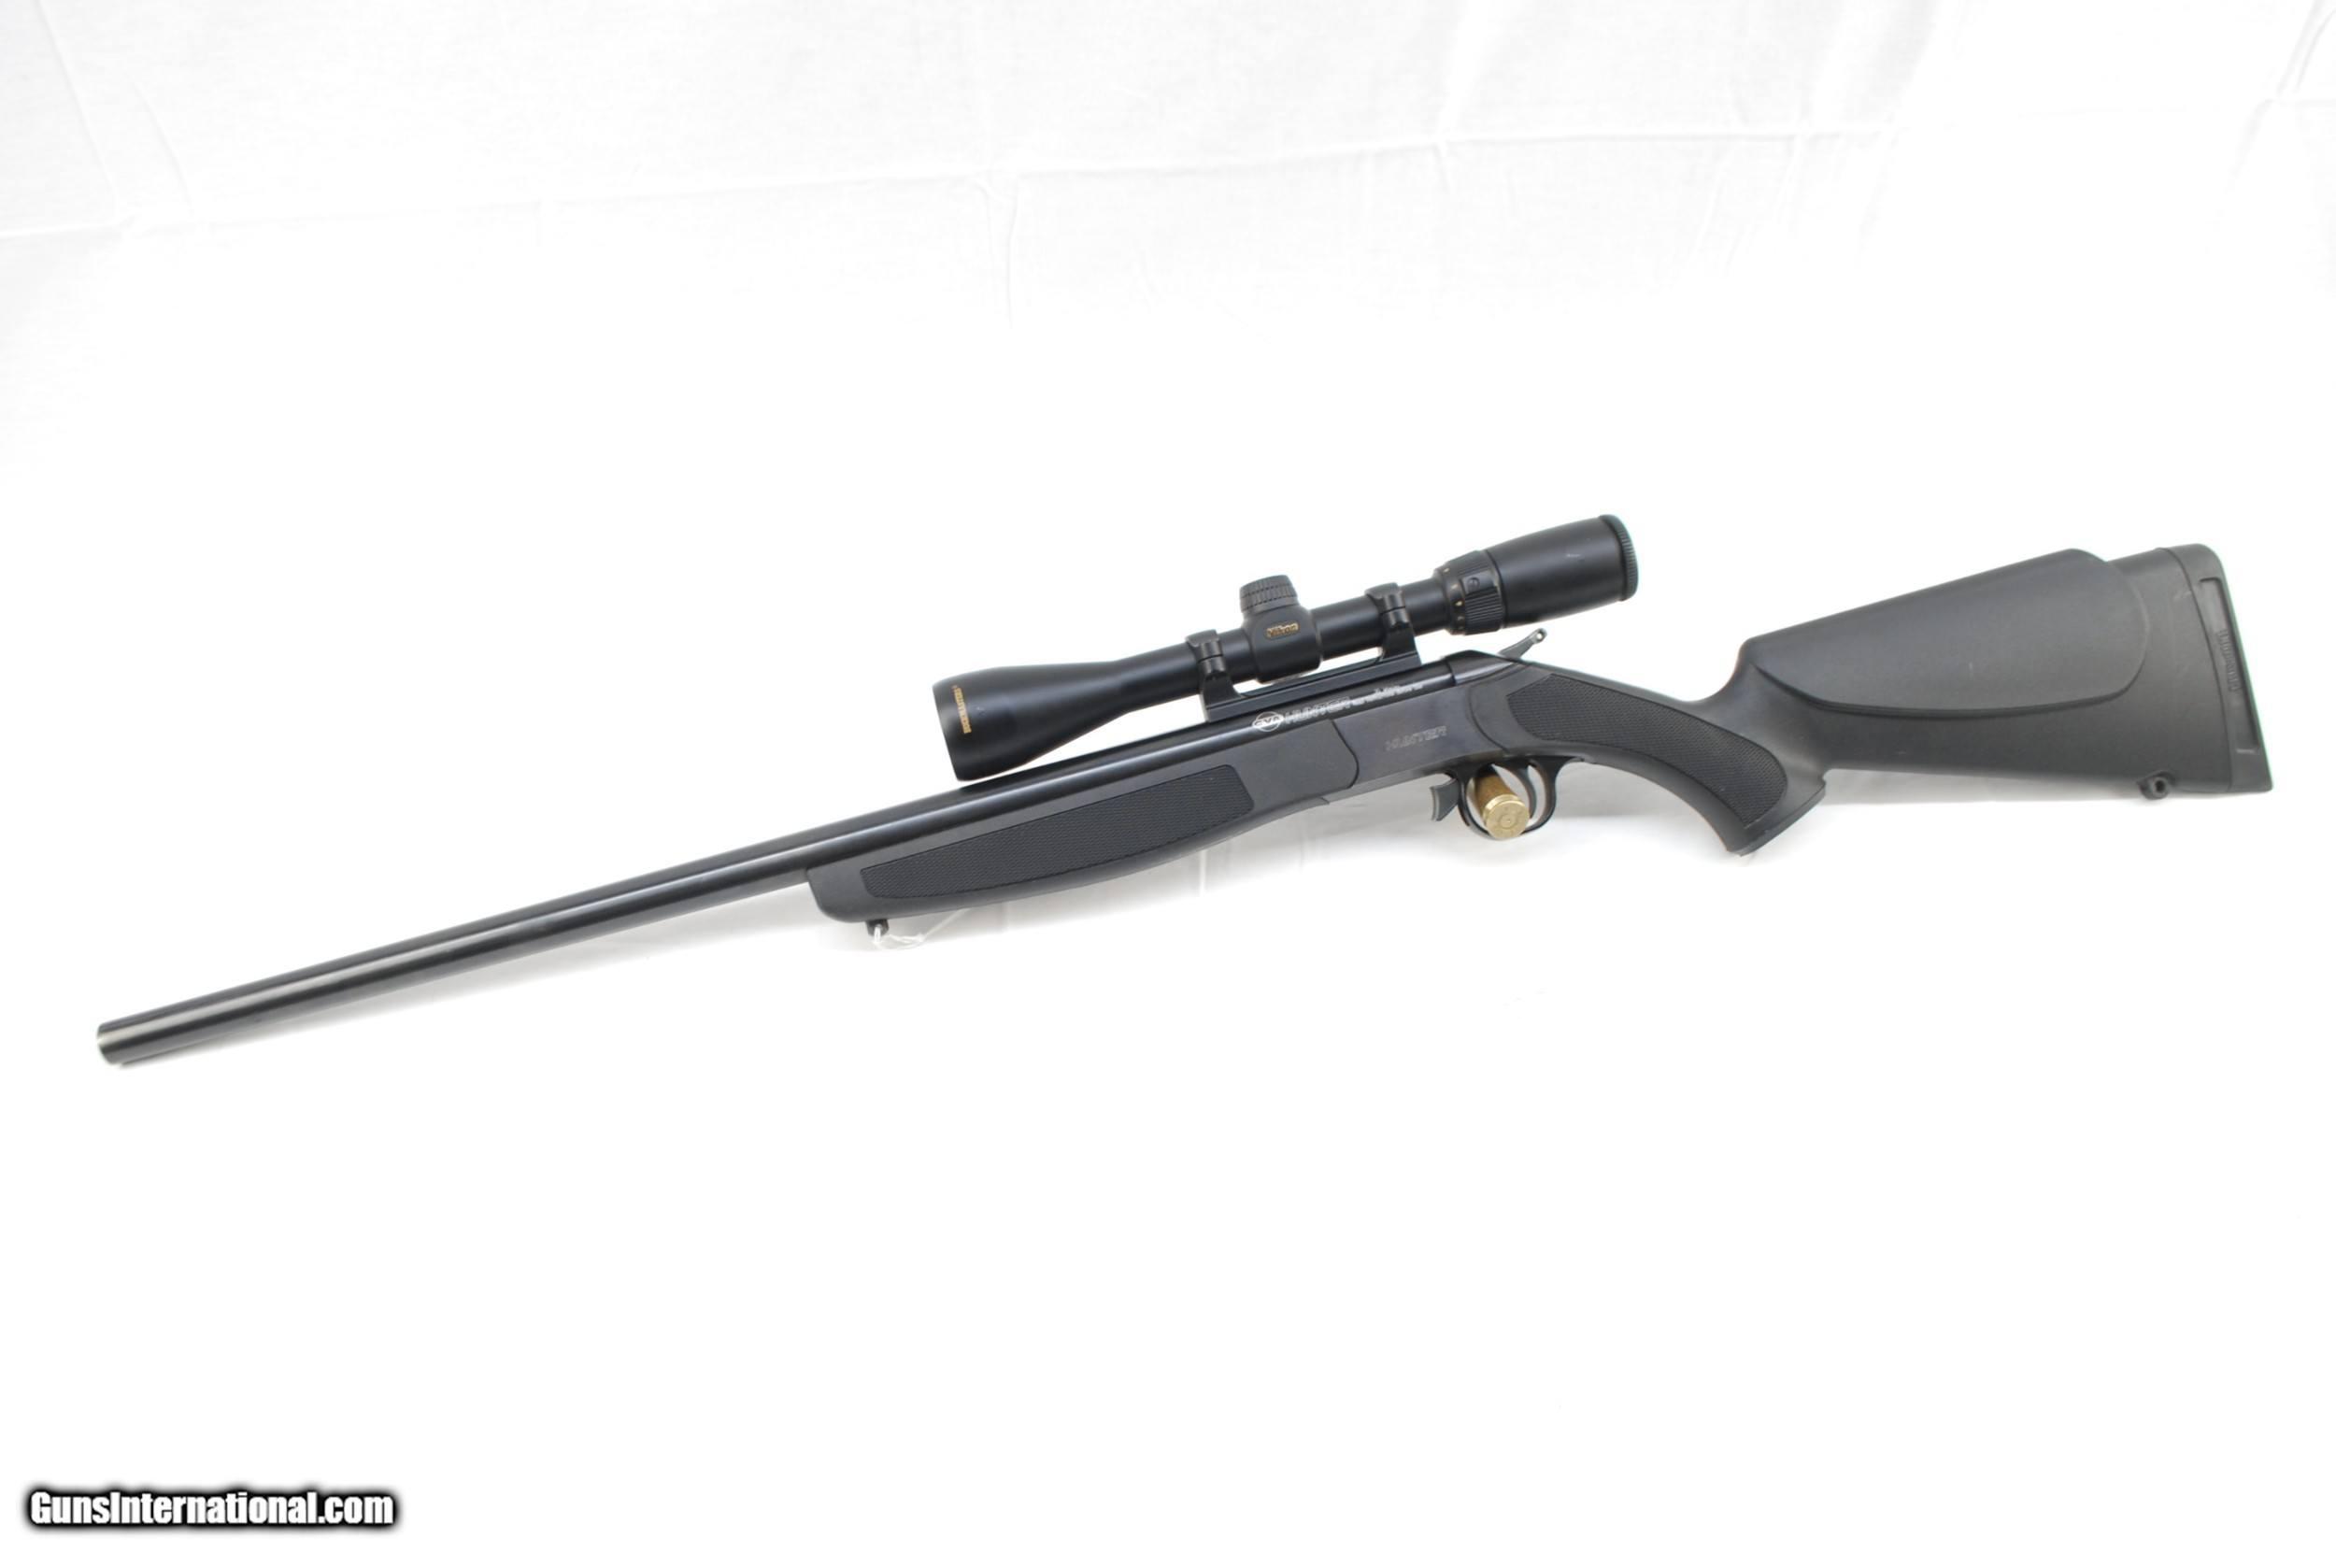 By Photo Congress || Cva 35 Whelen Rifle For Sale